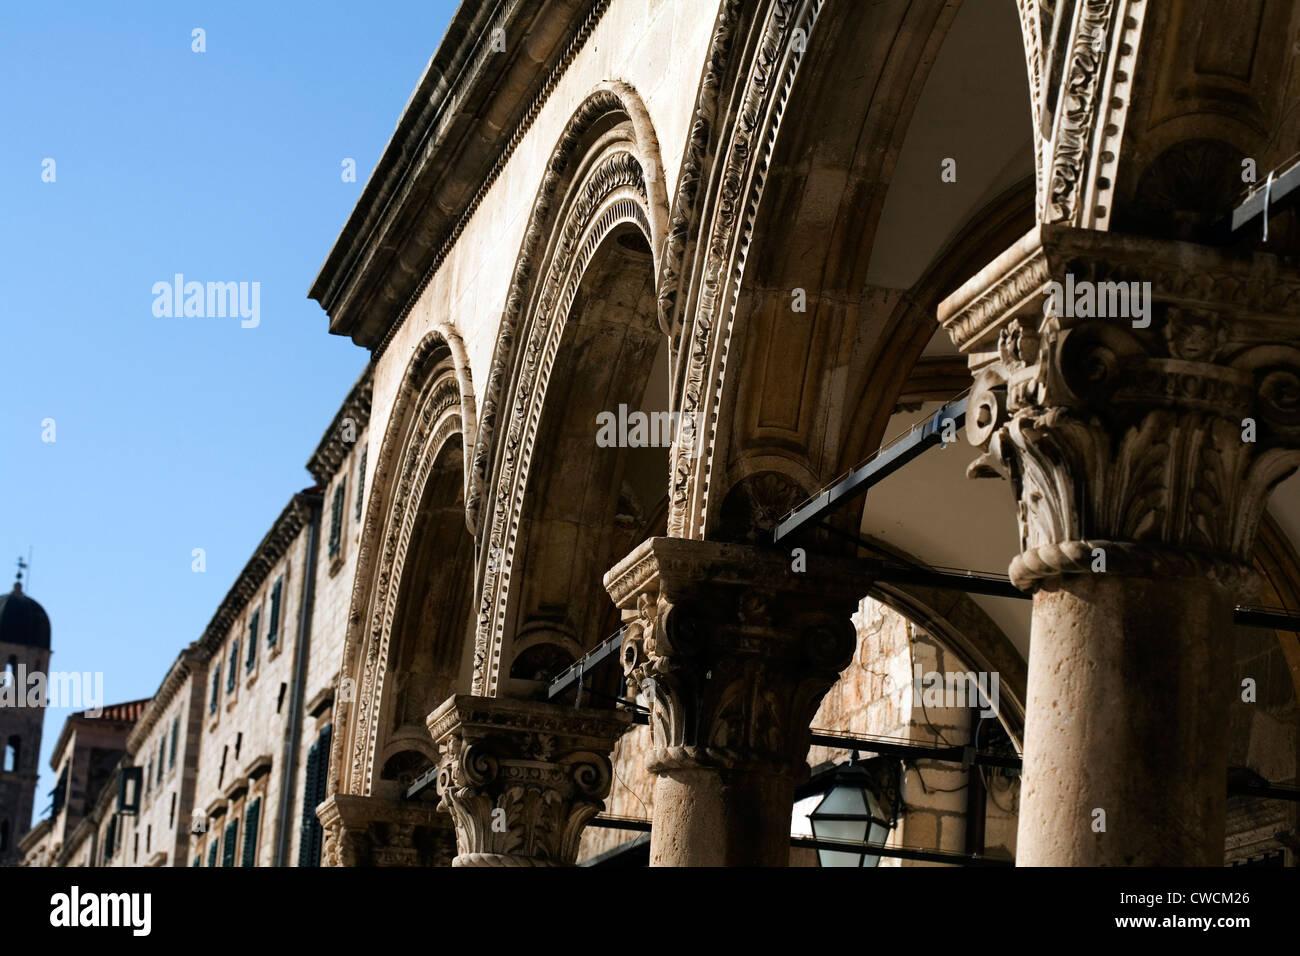 The Sponza Palace showing detail of the Venetian Gothic decoration Dubrovnik Dalmatia Croatia - Stock Image